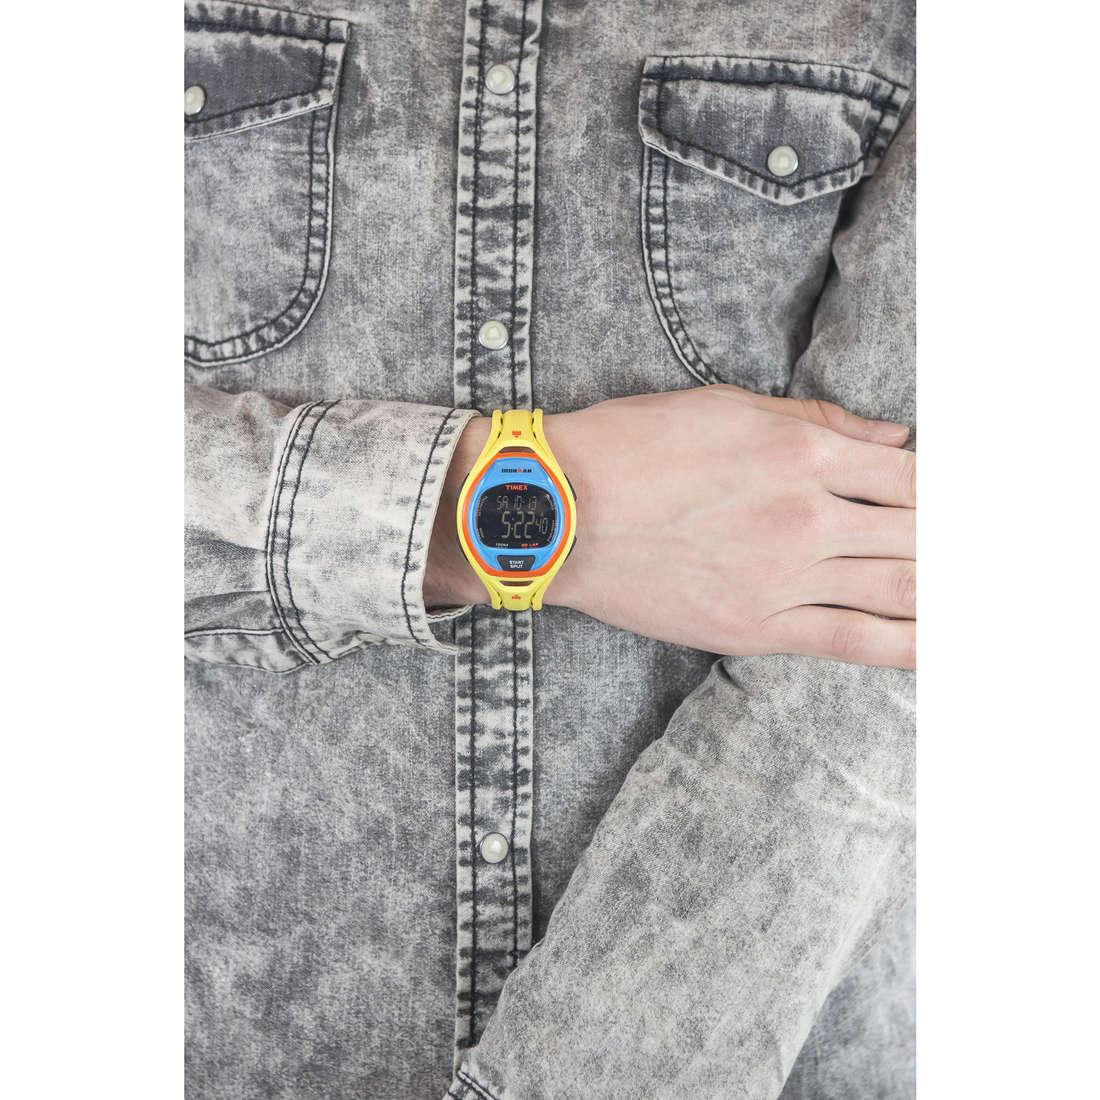 Timex digitals Ironman Colors man TW5M01500 indosso